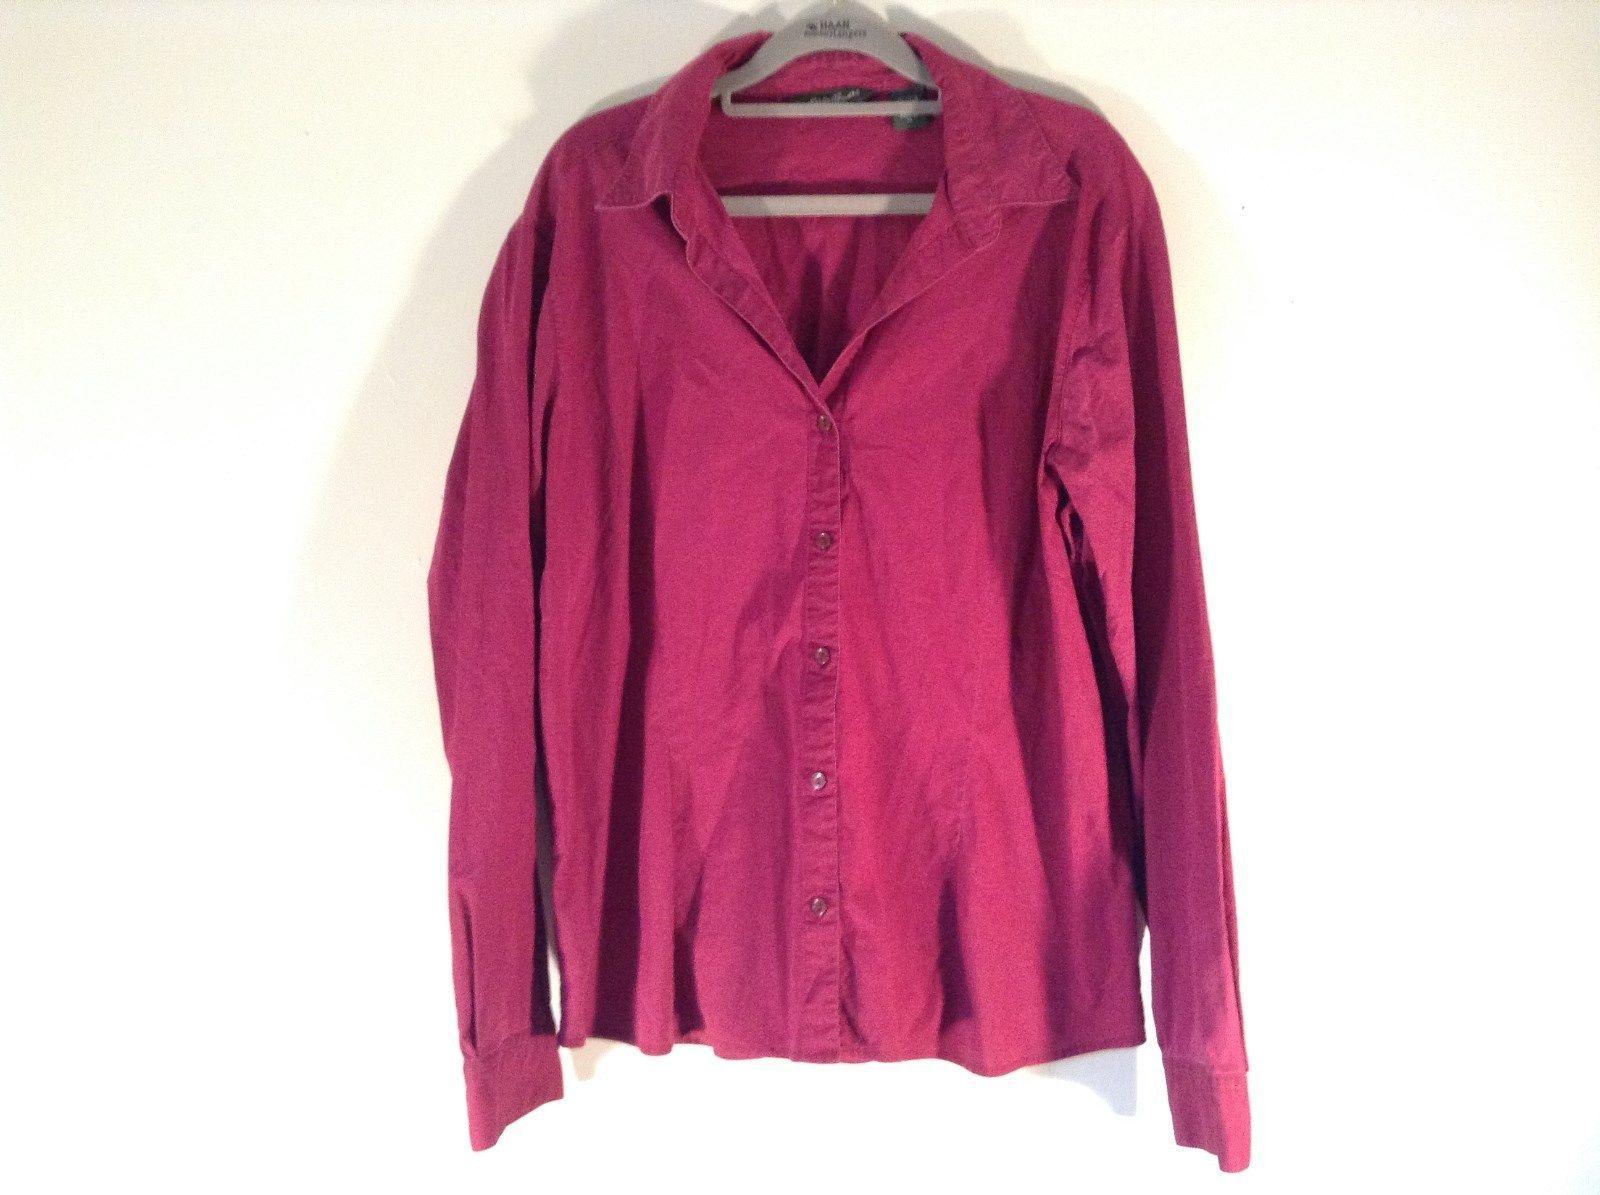 Very Nice Long Sleeve Magenta Eddie Bauer Button Down Shirt Size XL